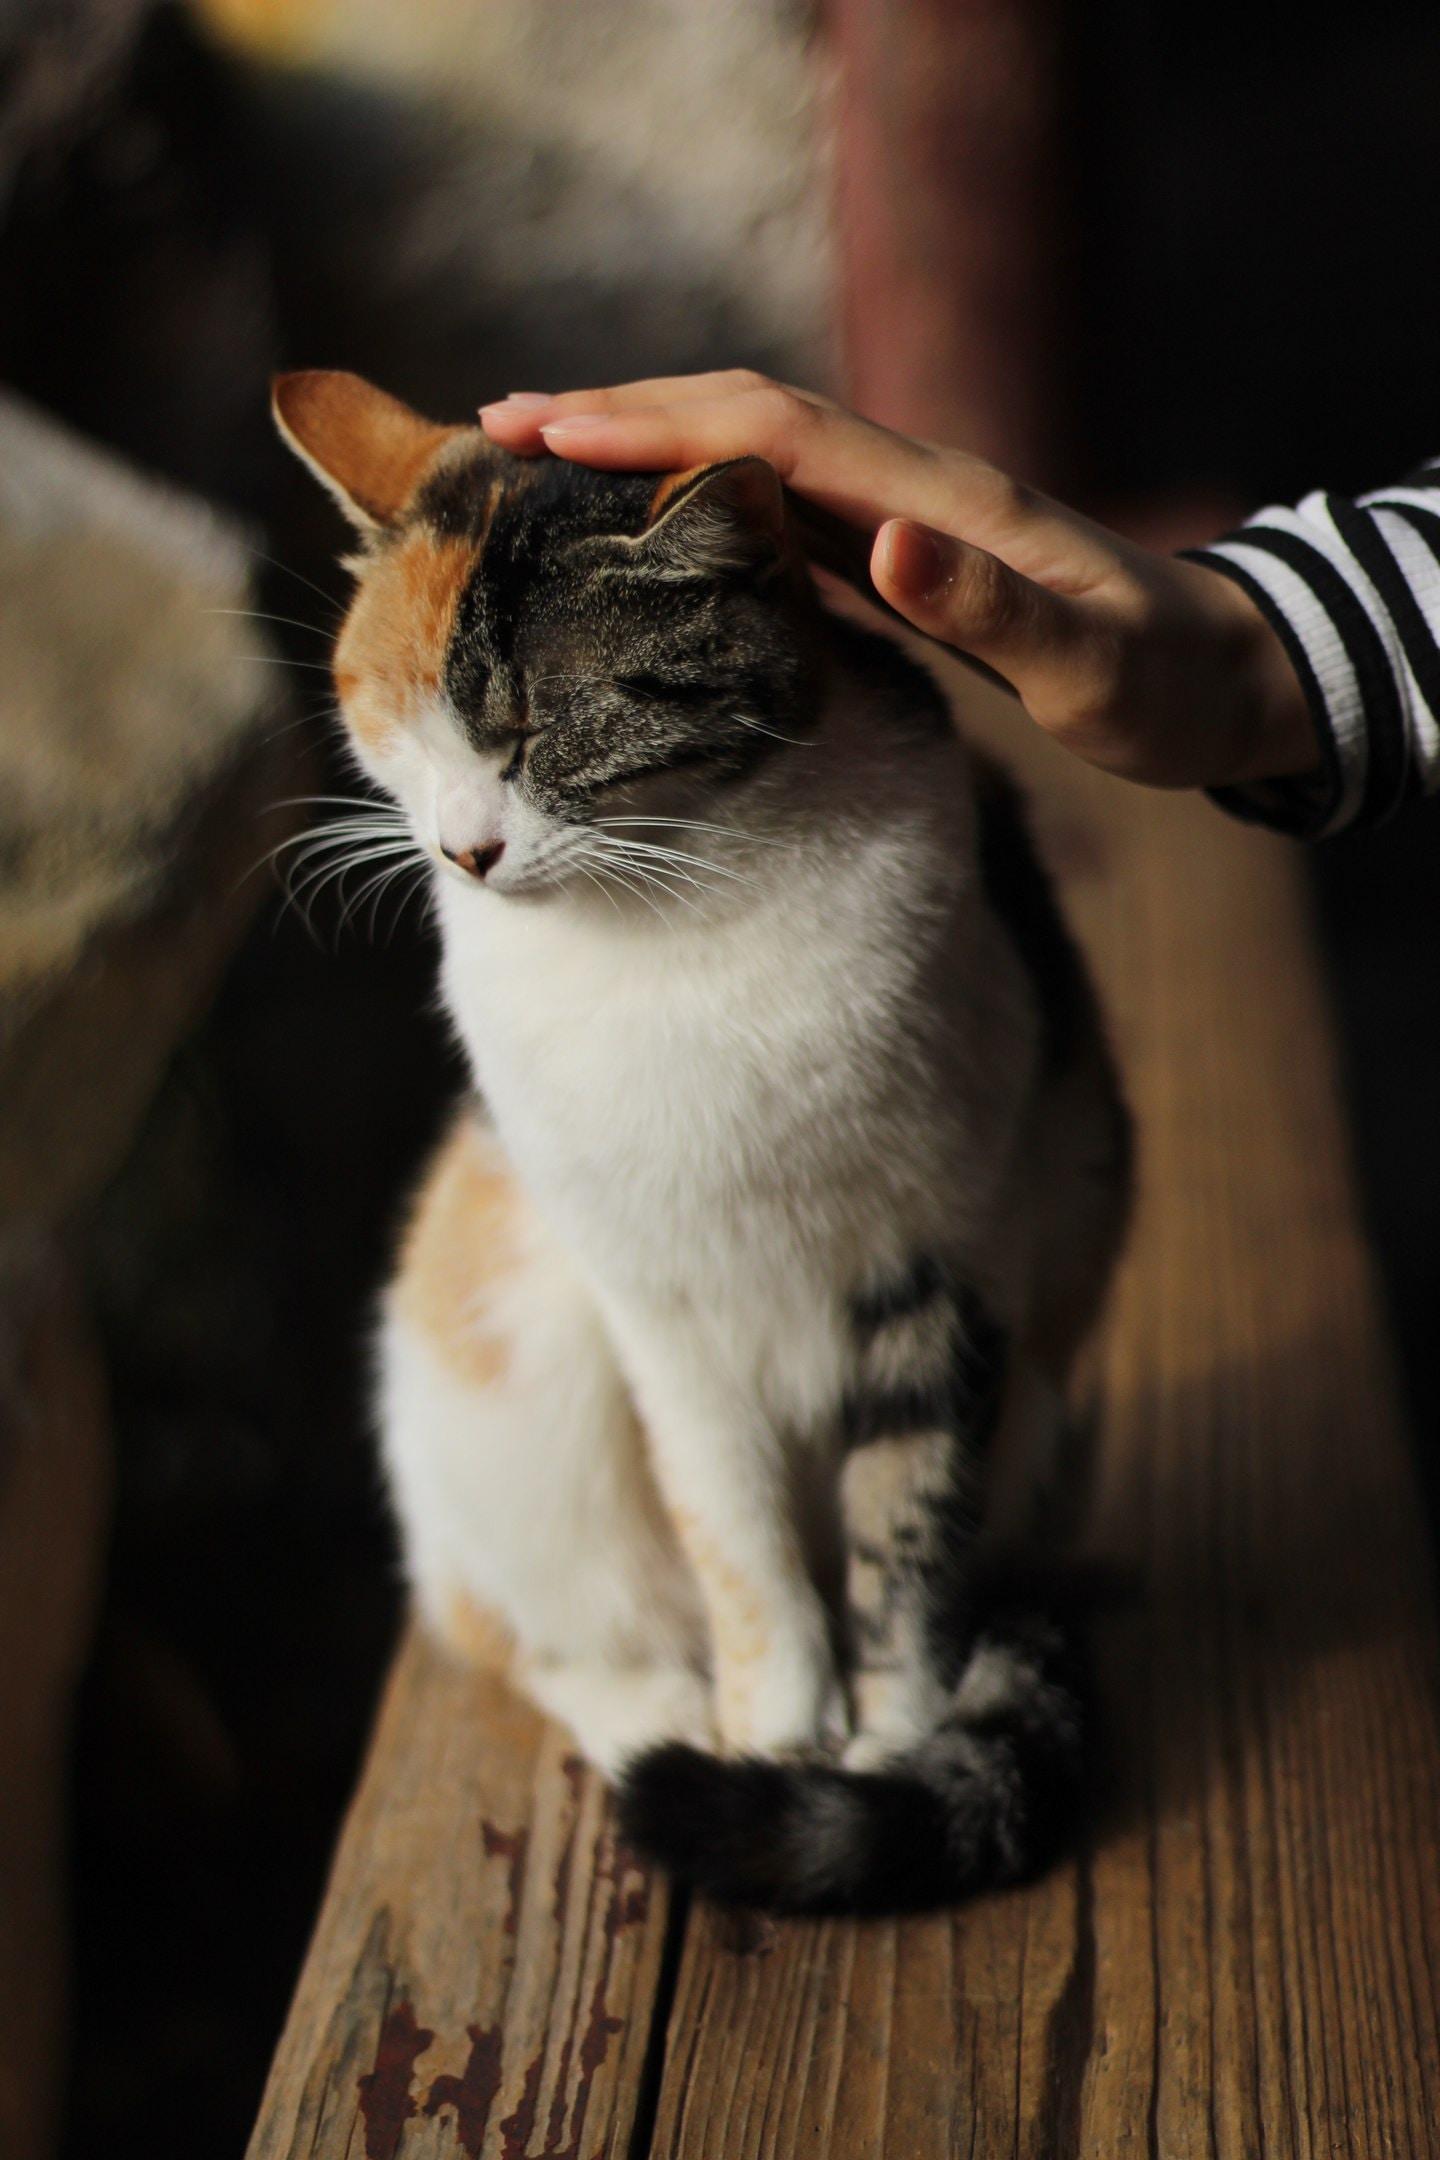 Hello Cat stories